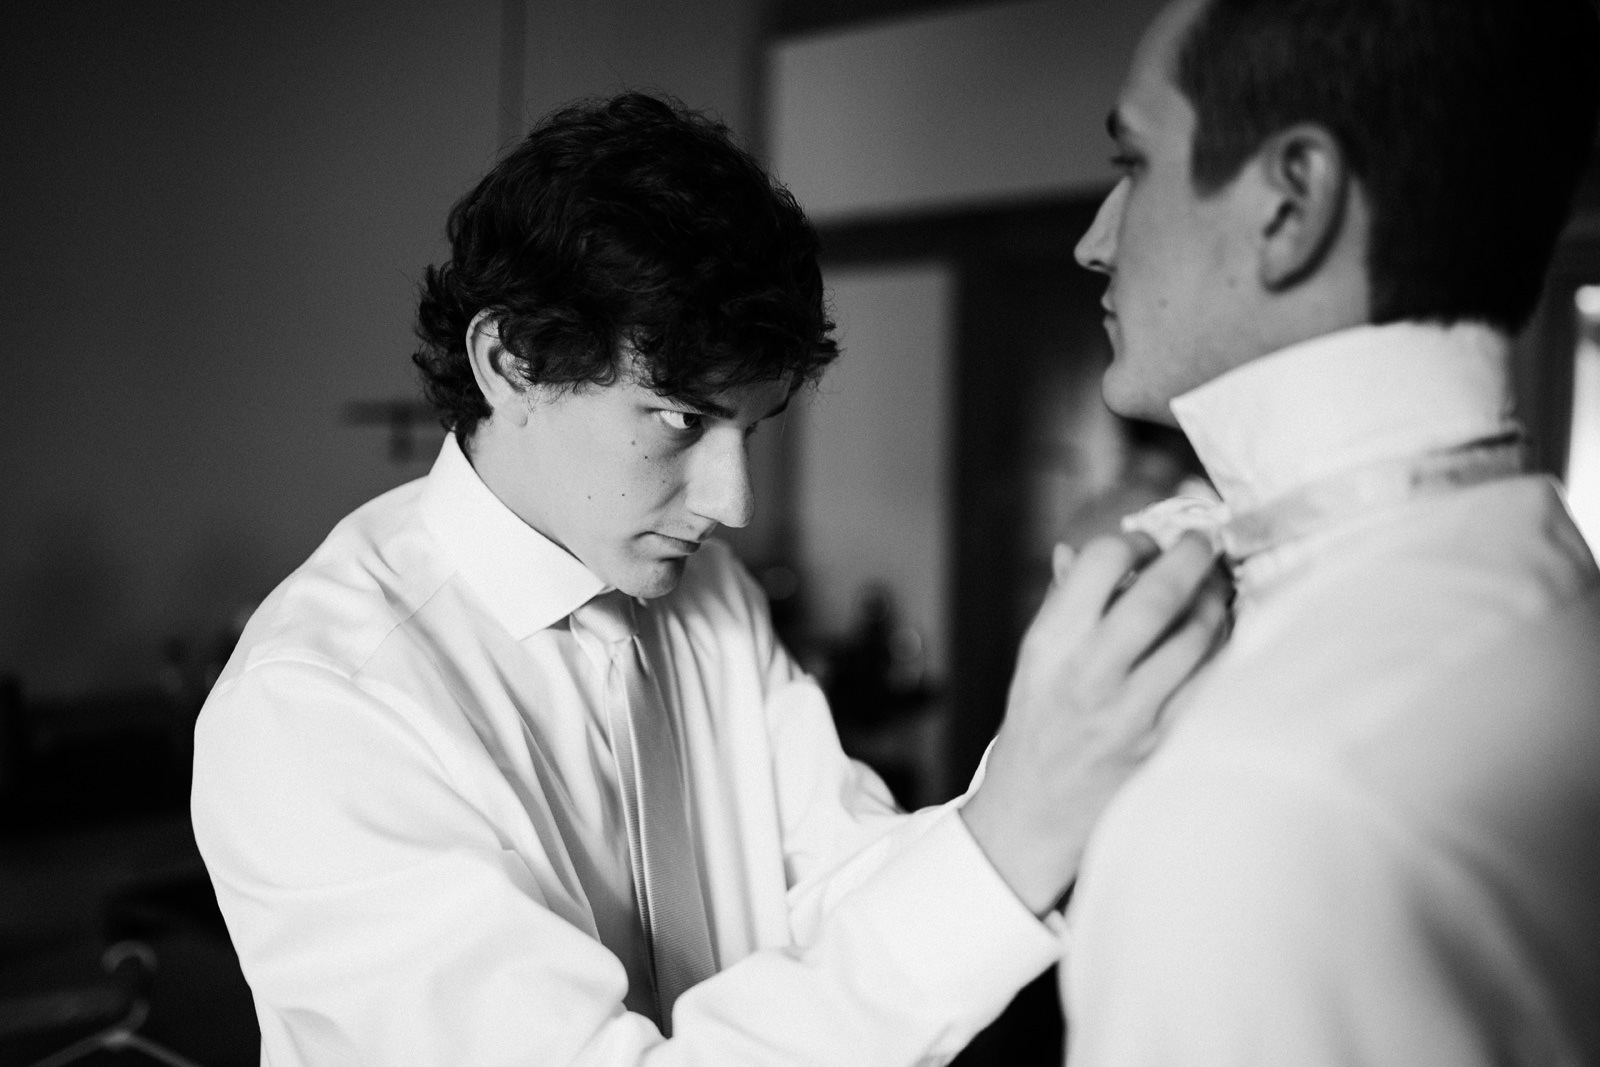 013-willows-lodge-wedding-prep-by-seattle-documentary-photographer.jpg